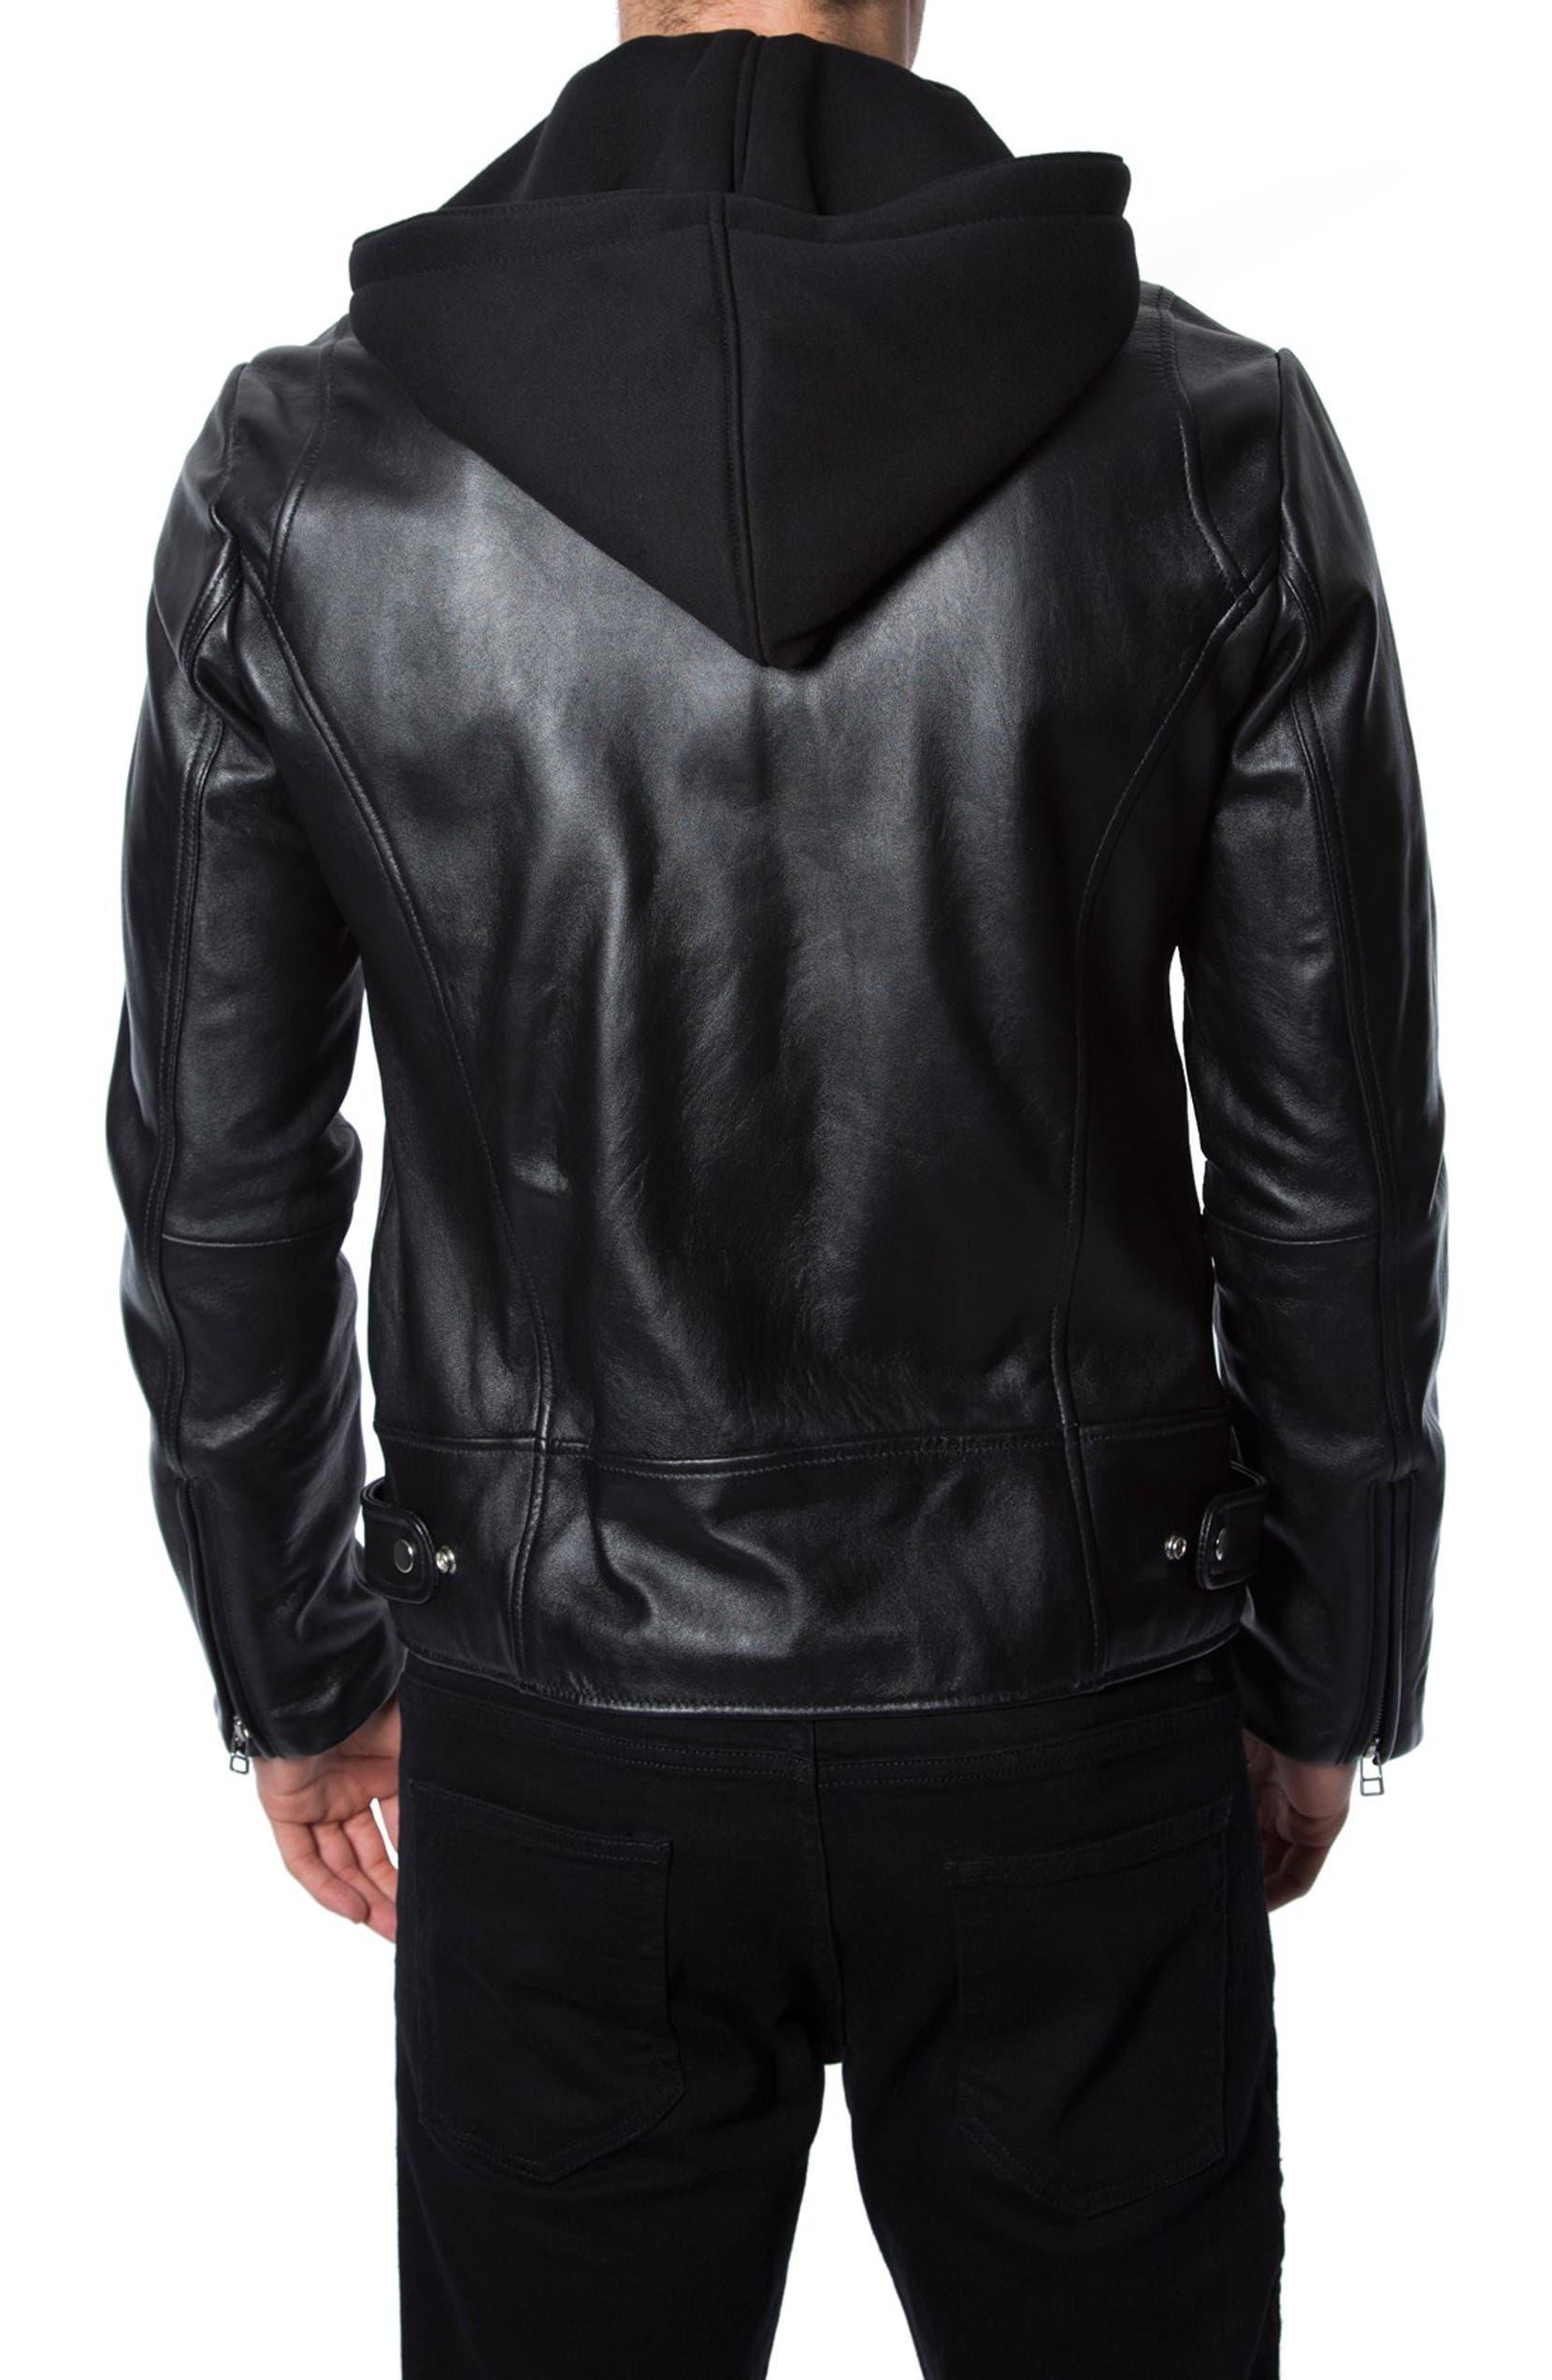 cb3d32325 7 Diamonds 'Thunderbird' Leather Moto Jacket with Removable Knit ...